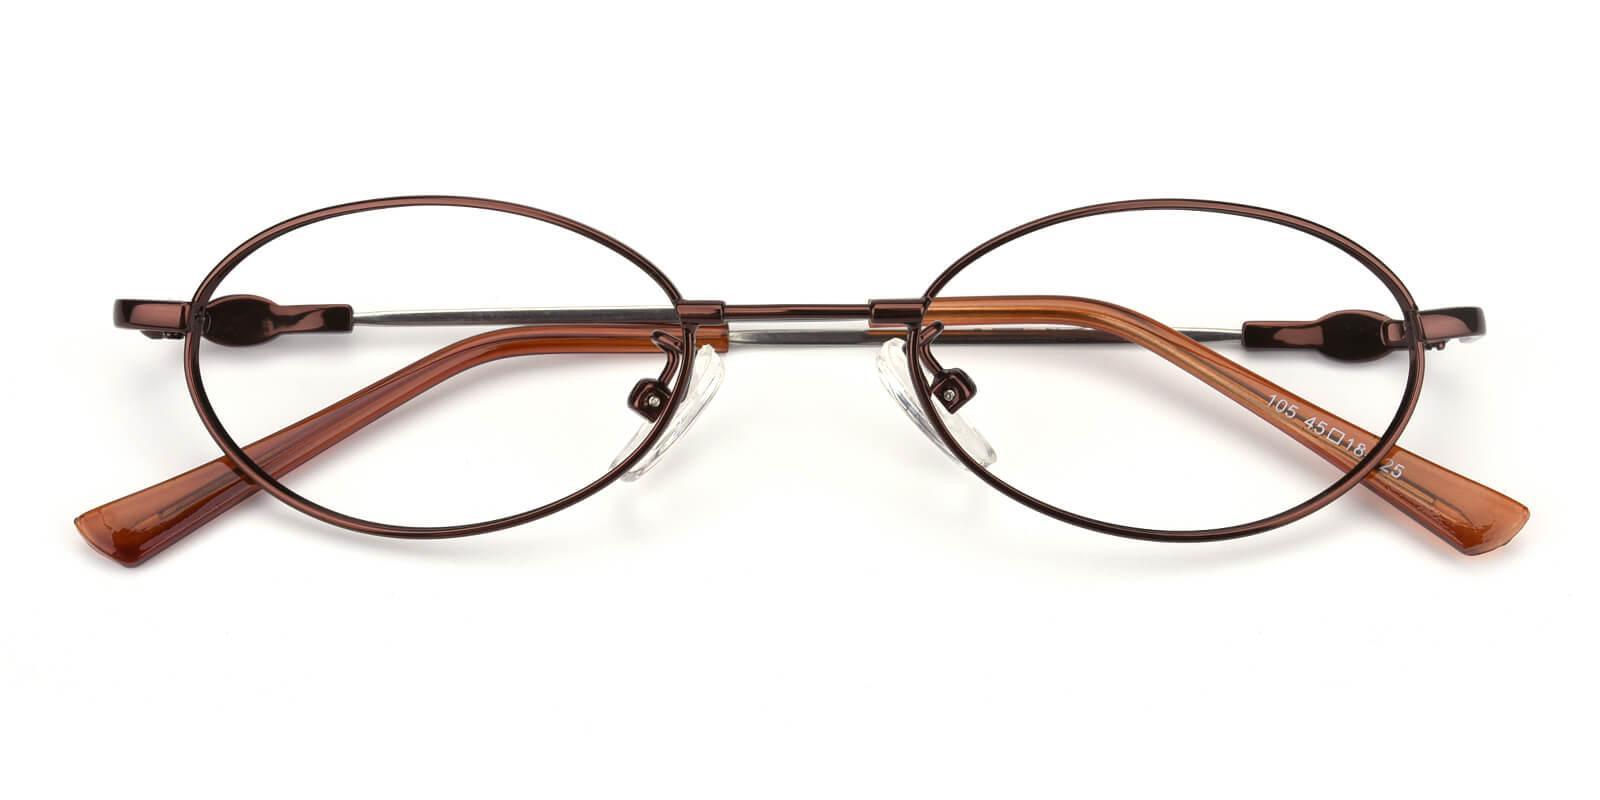 Mikestar-Brown-Oval-Titanium-Eyeglasses-detail